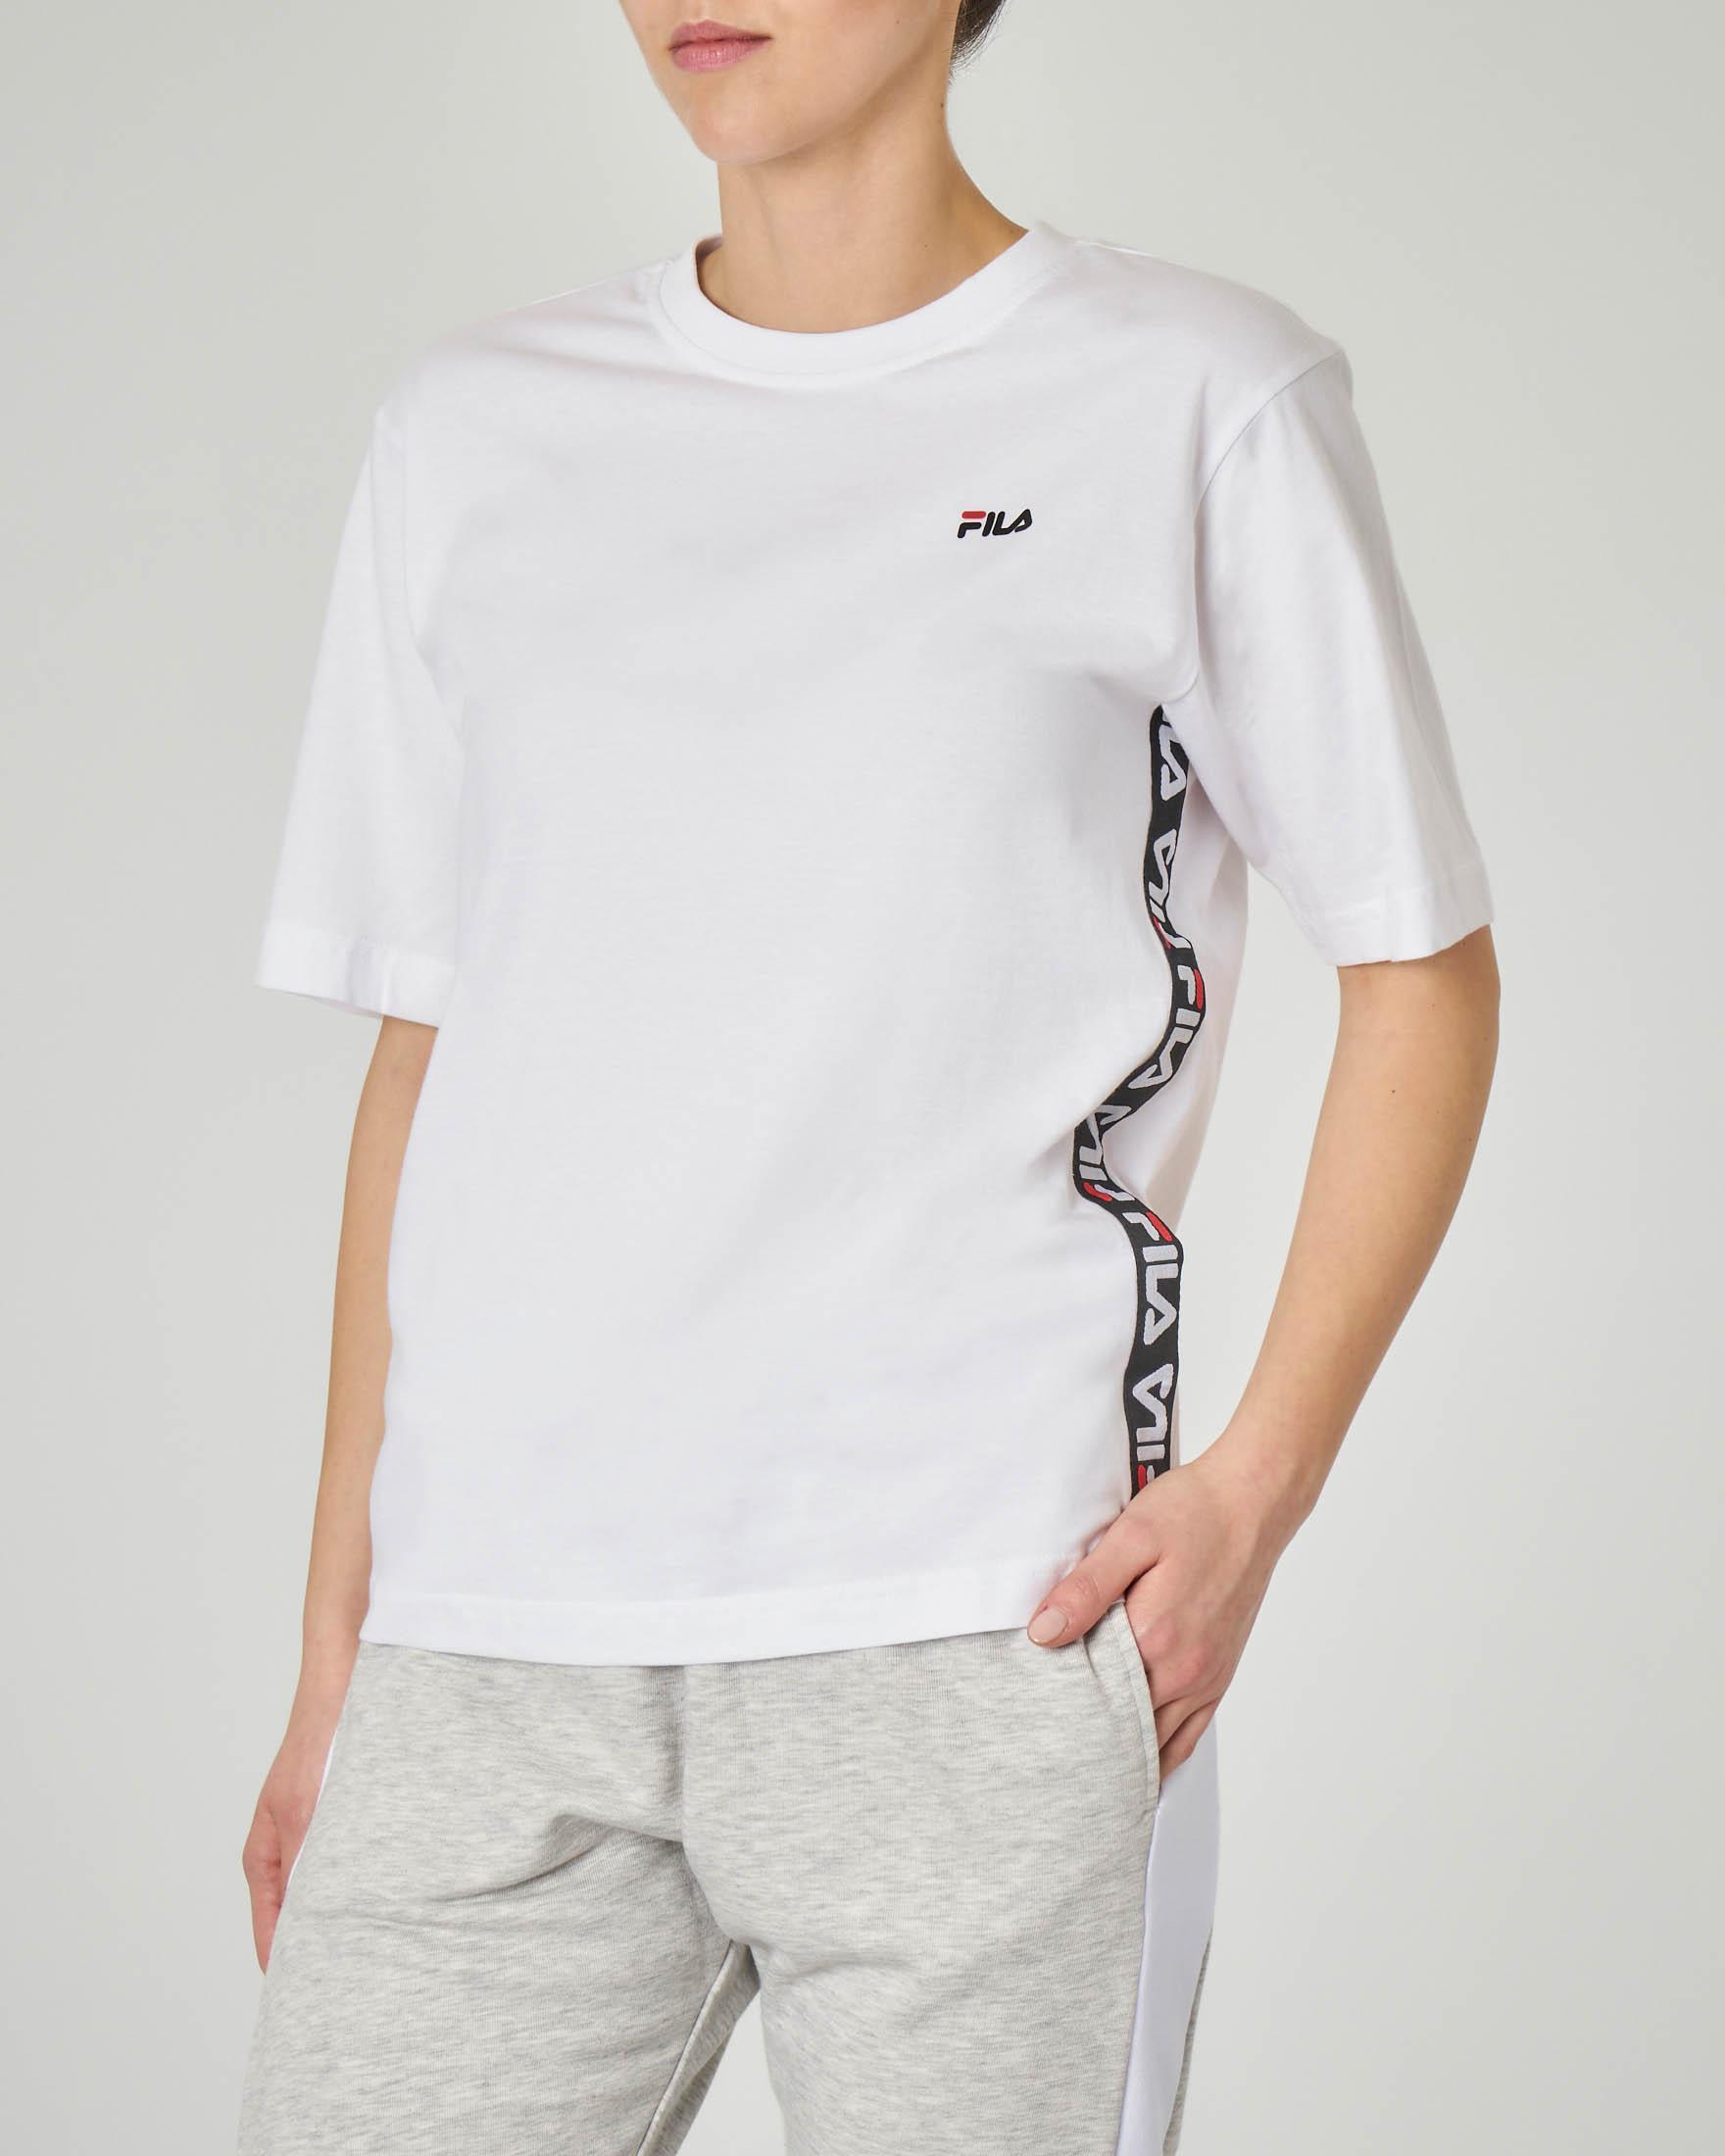 T-shirt bianca cin cotone con banda logo laterale